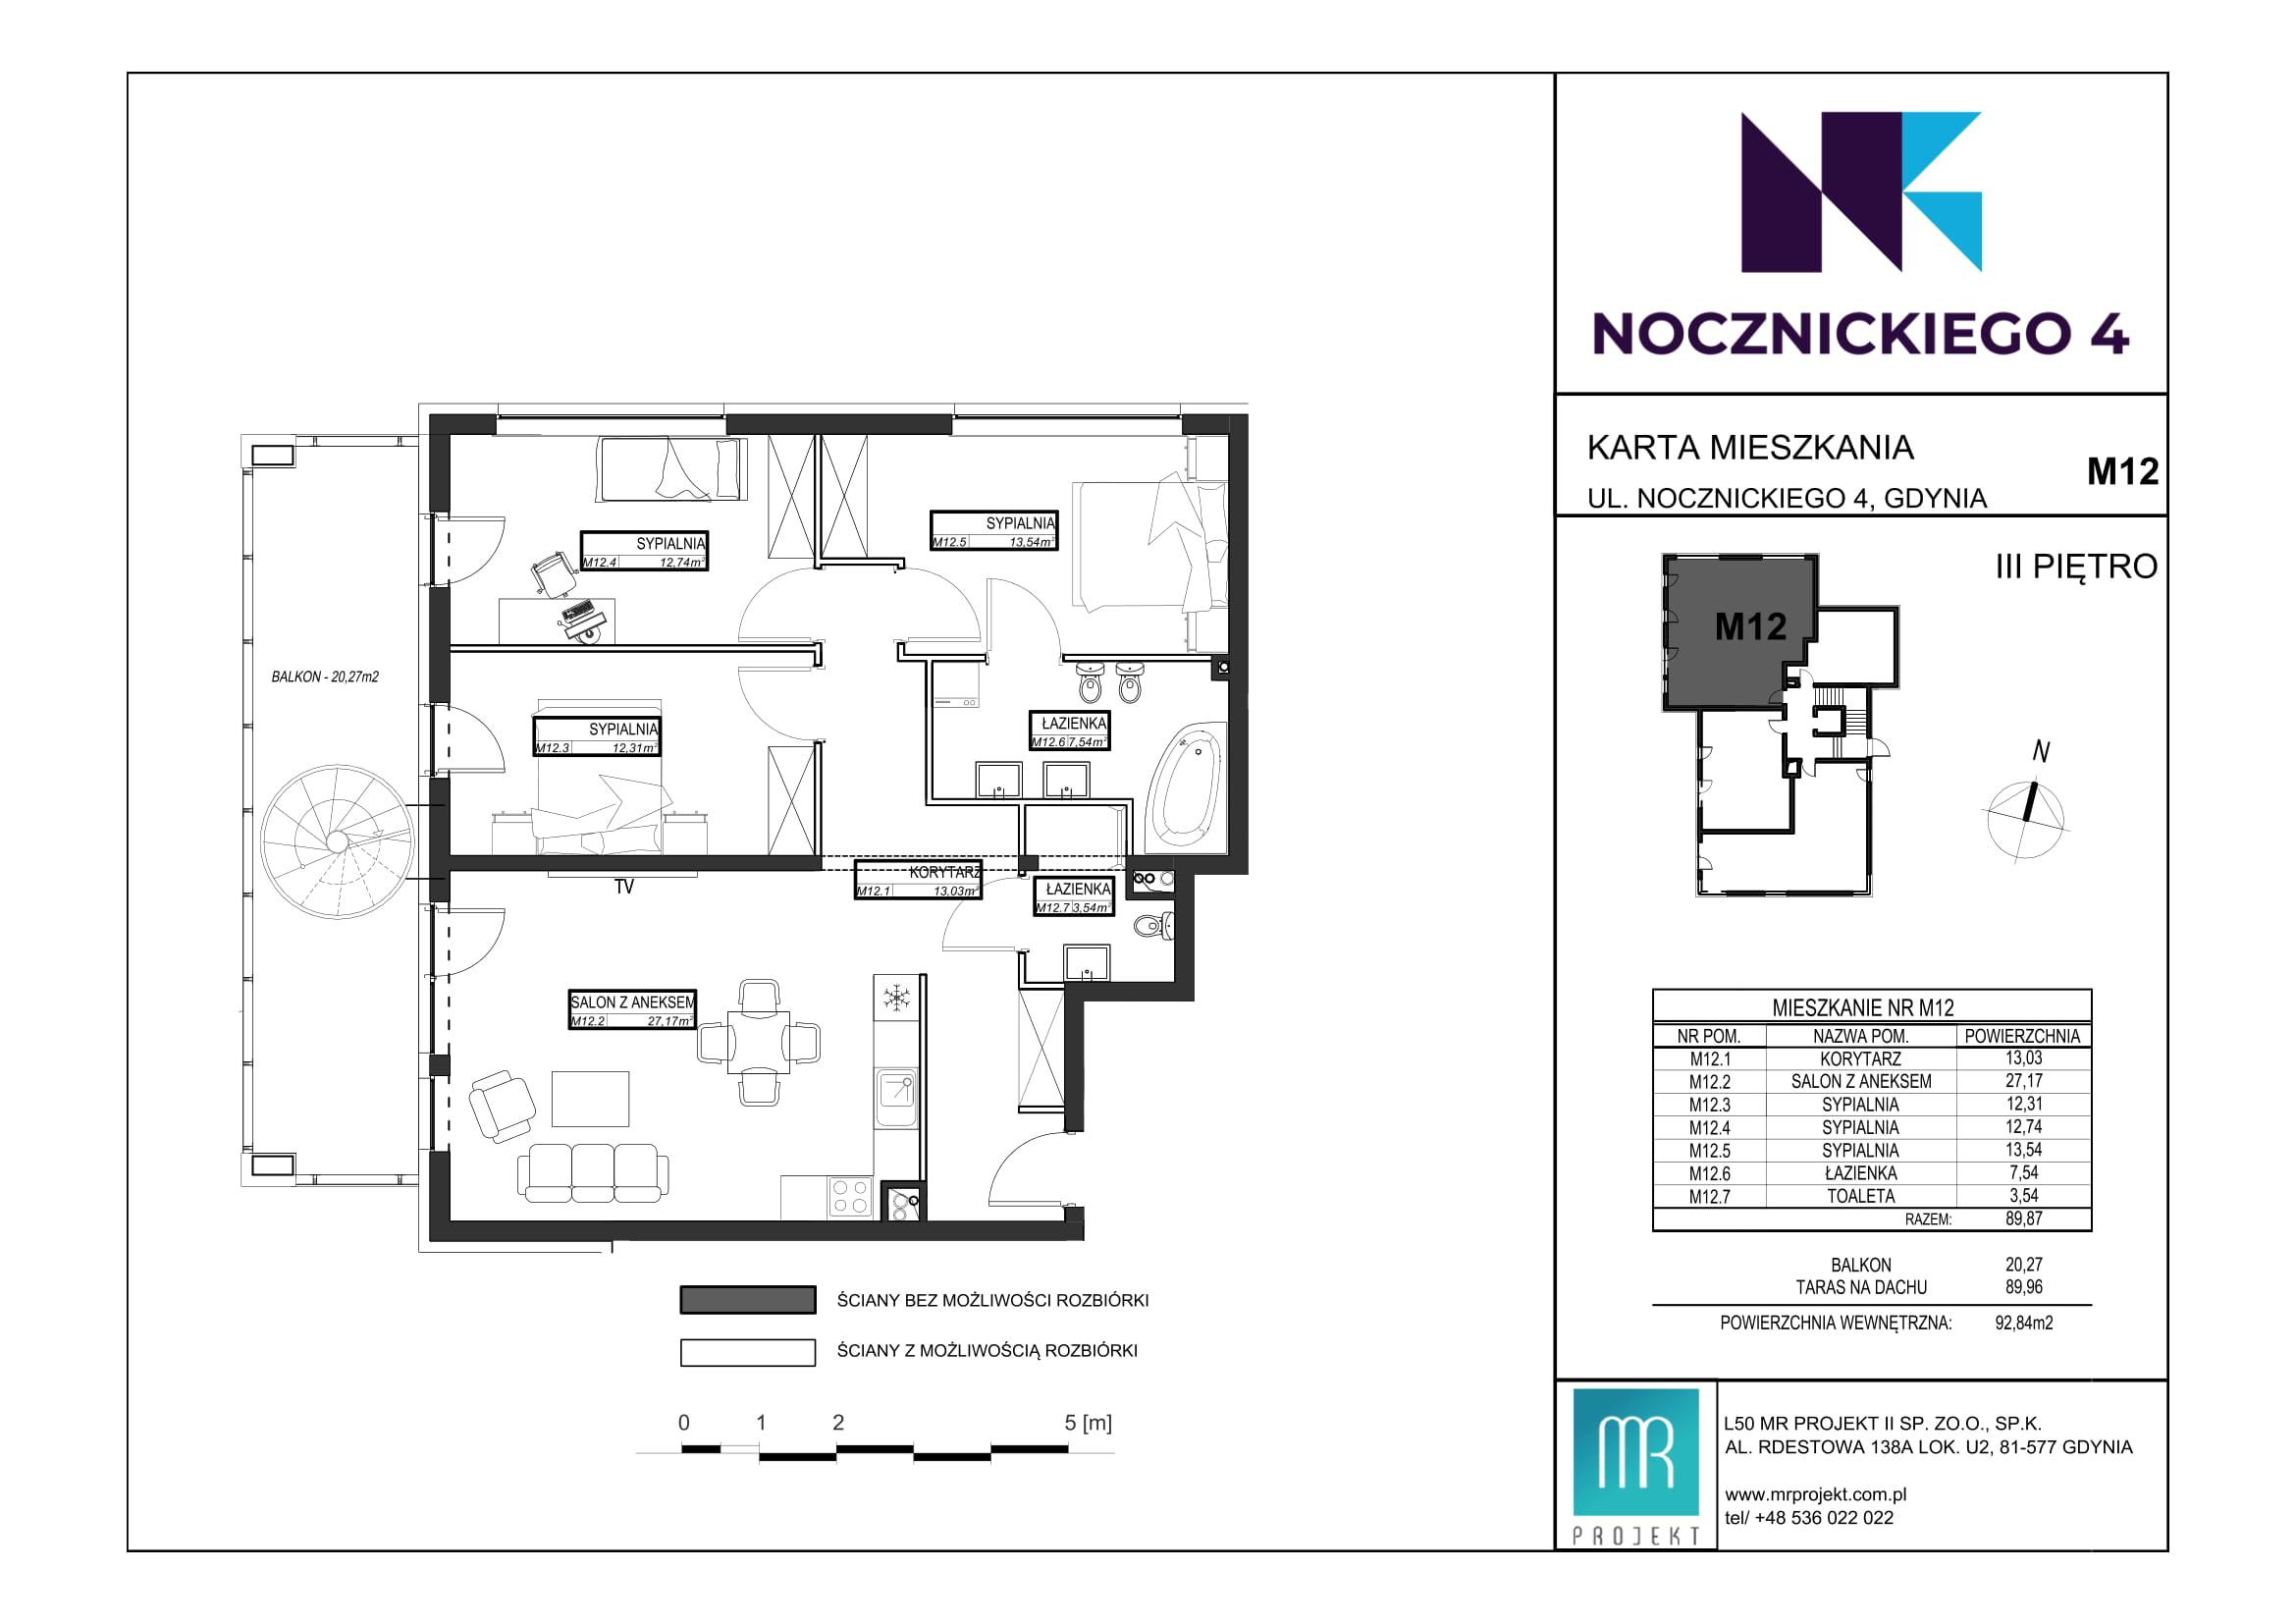 Rzut mieszkania M12